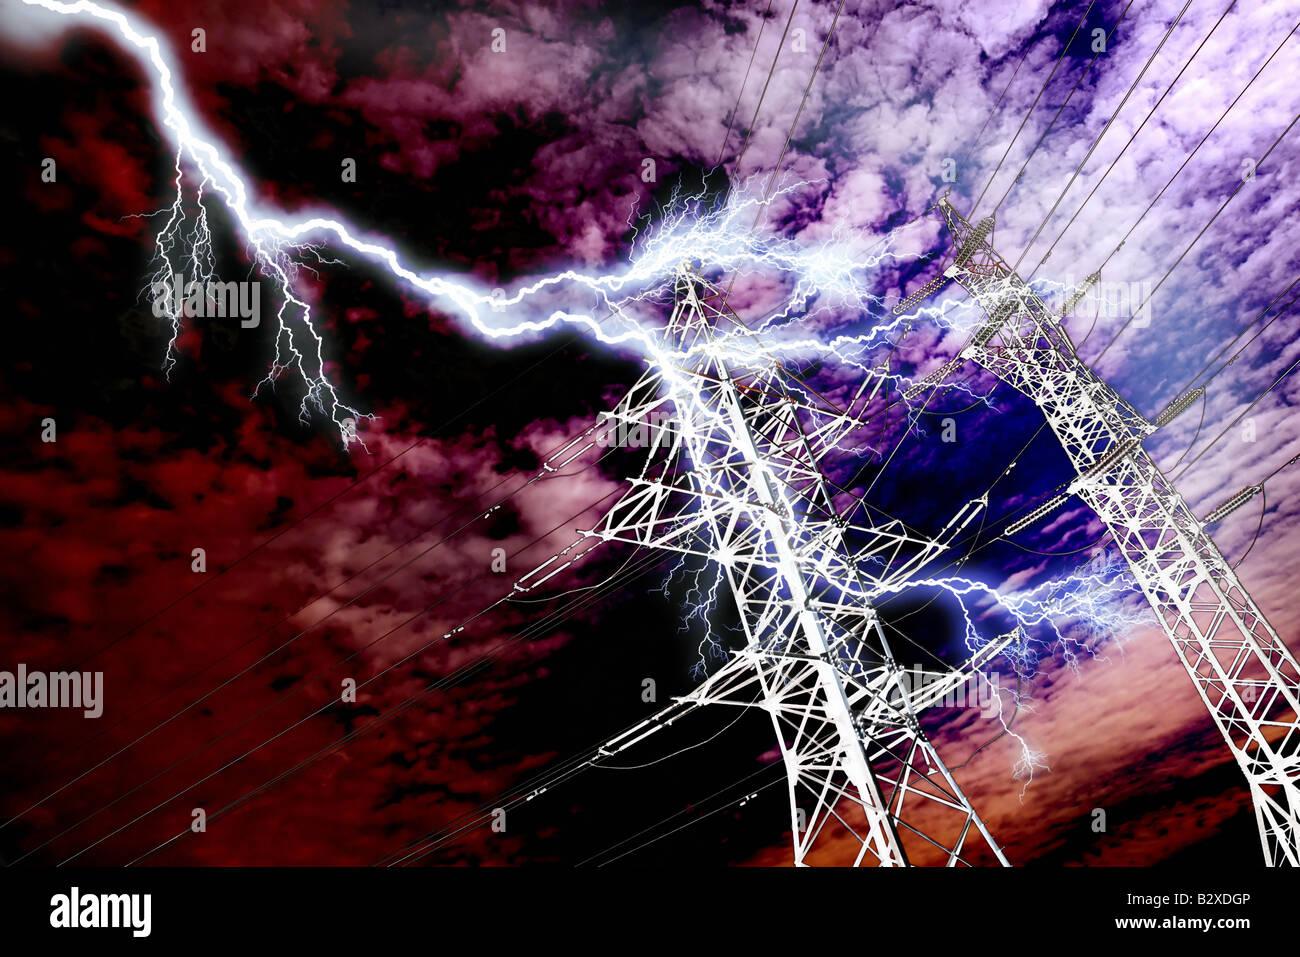 Lightning strike to high voltage power line pillar - Stock Image